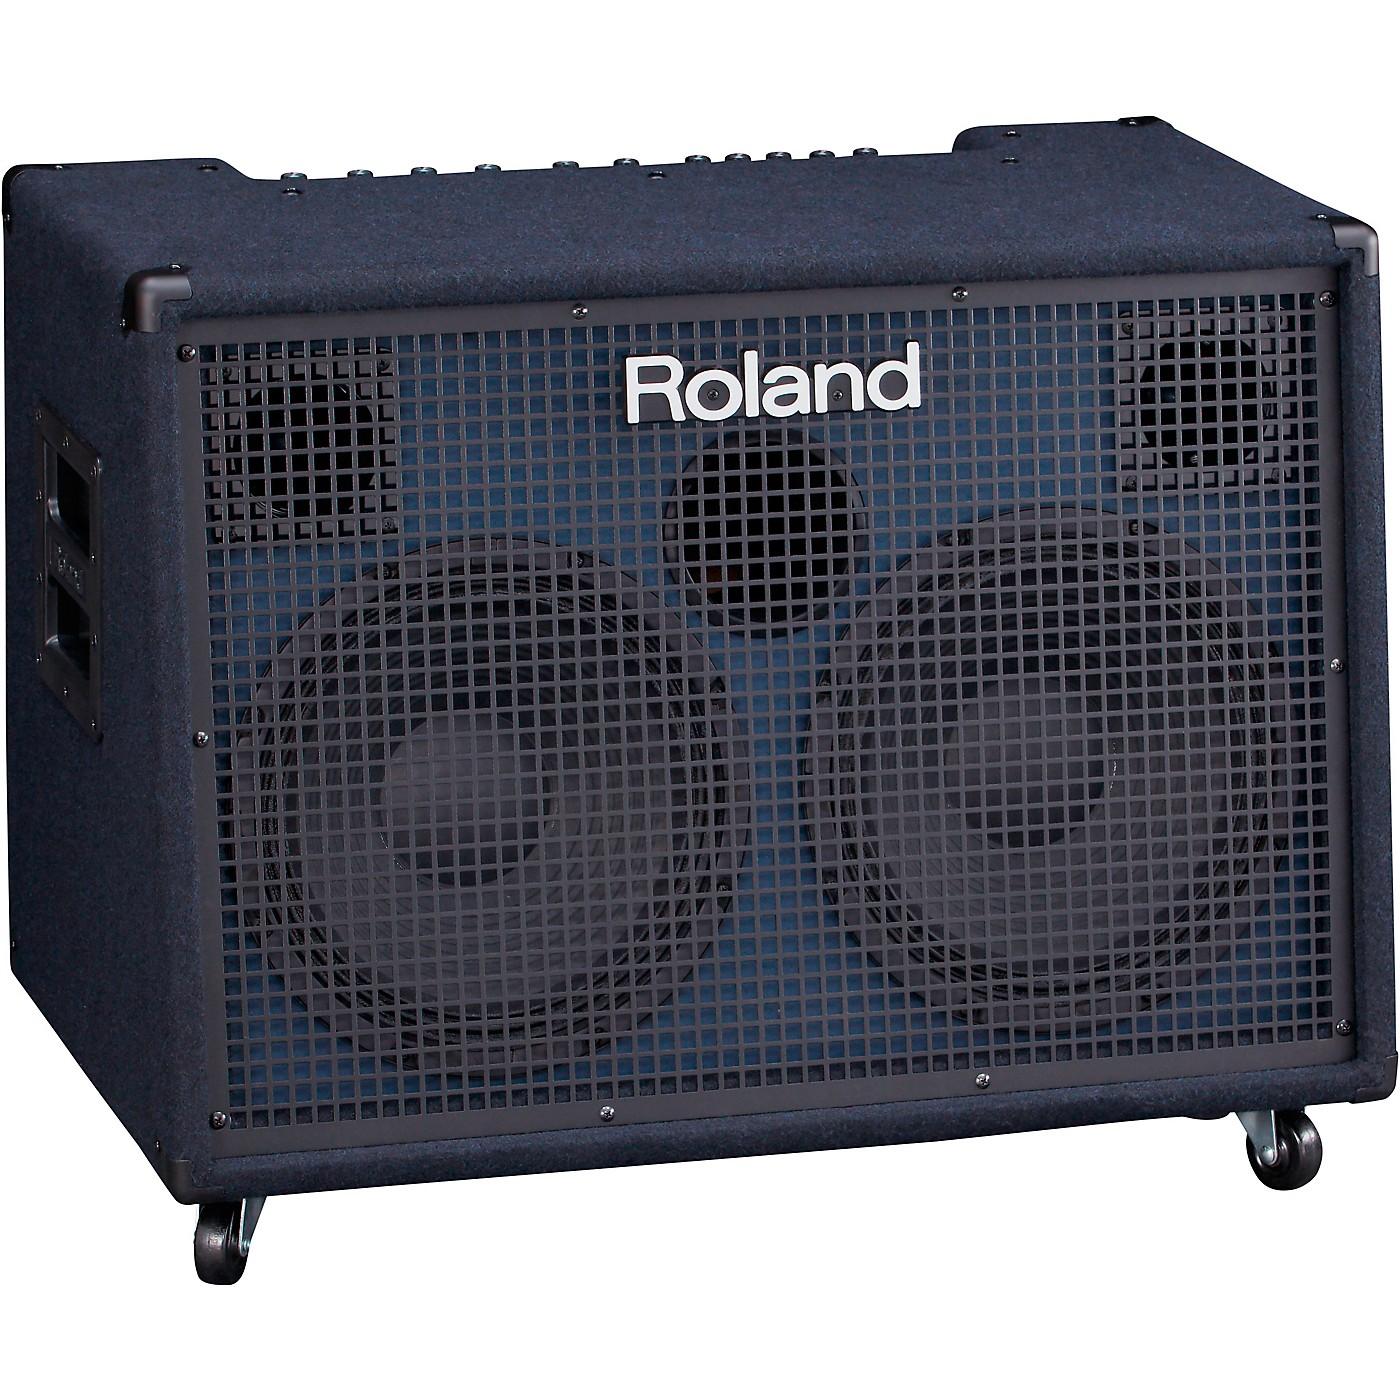 Roland KC-990 Keyboard Amplifier thumbnail